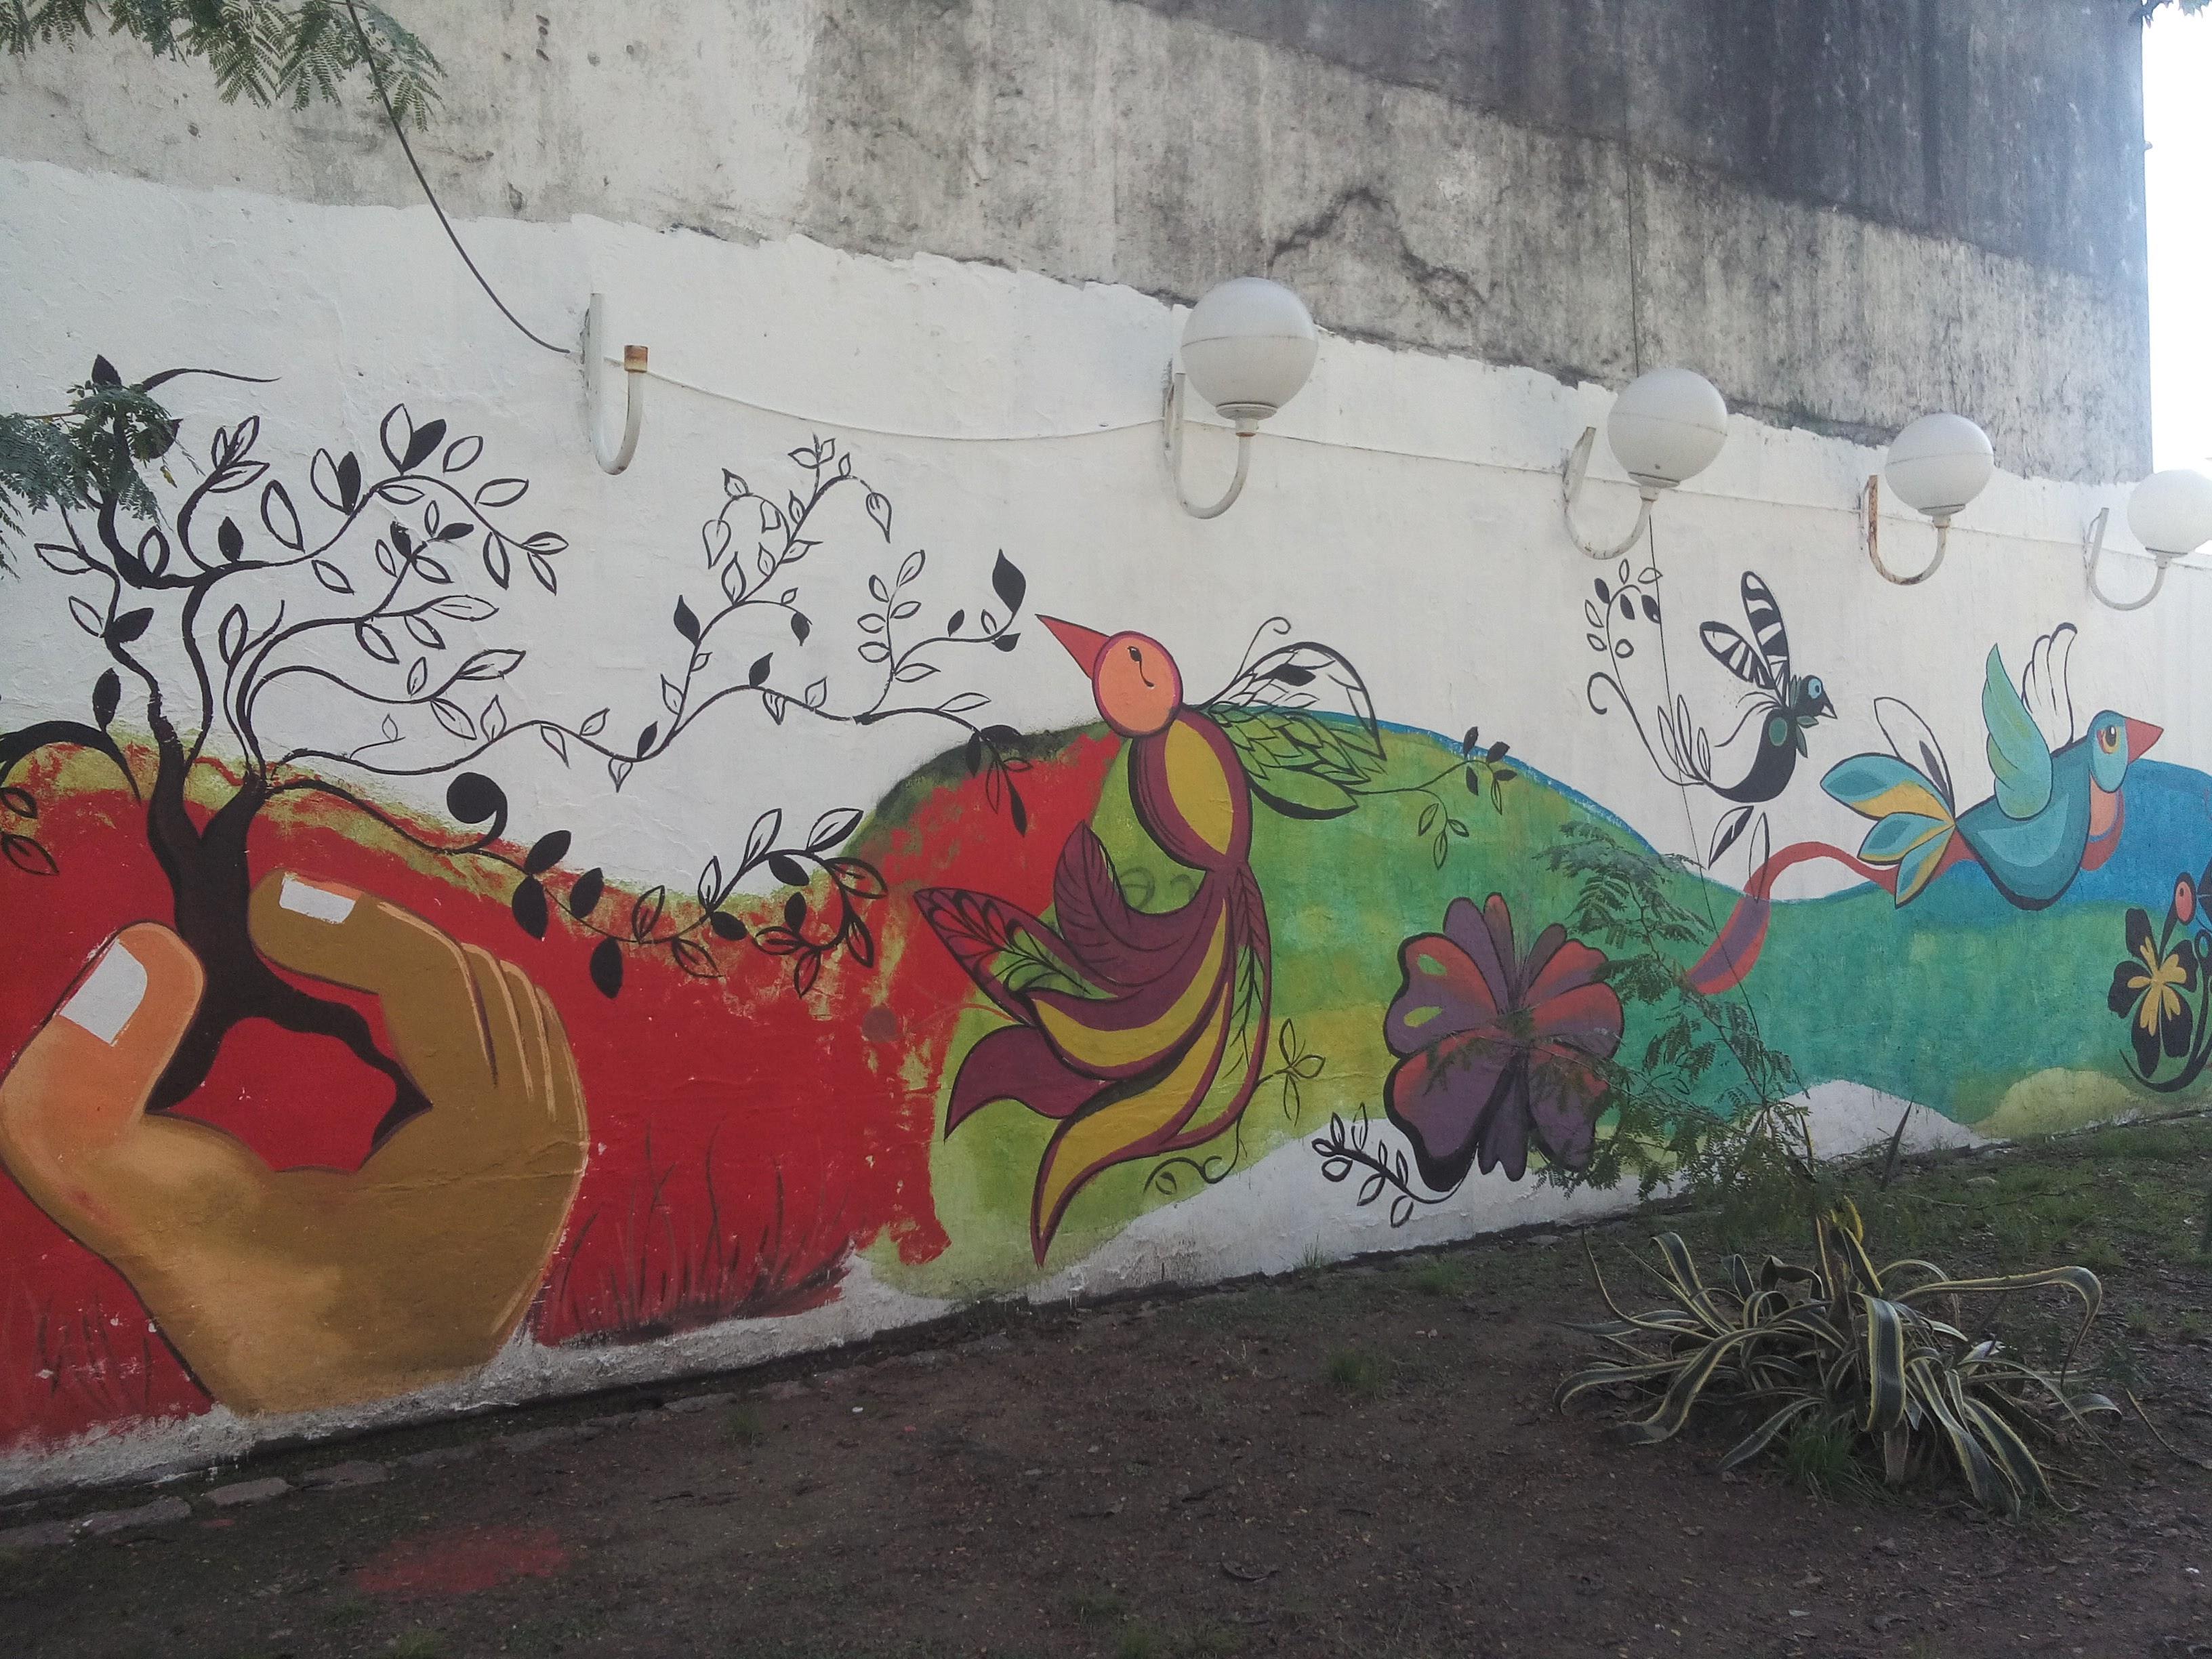 Mural en Plaza Concordia 4 - Mural en Plaza Concordia